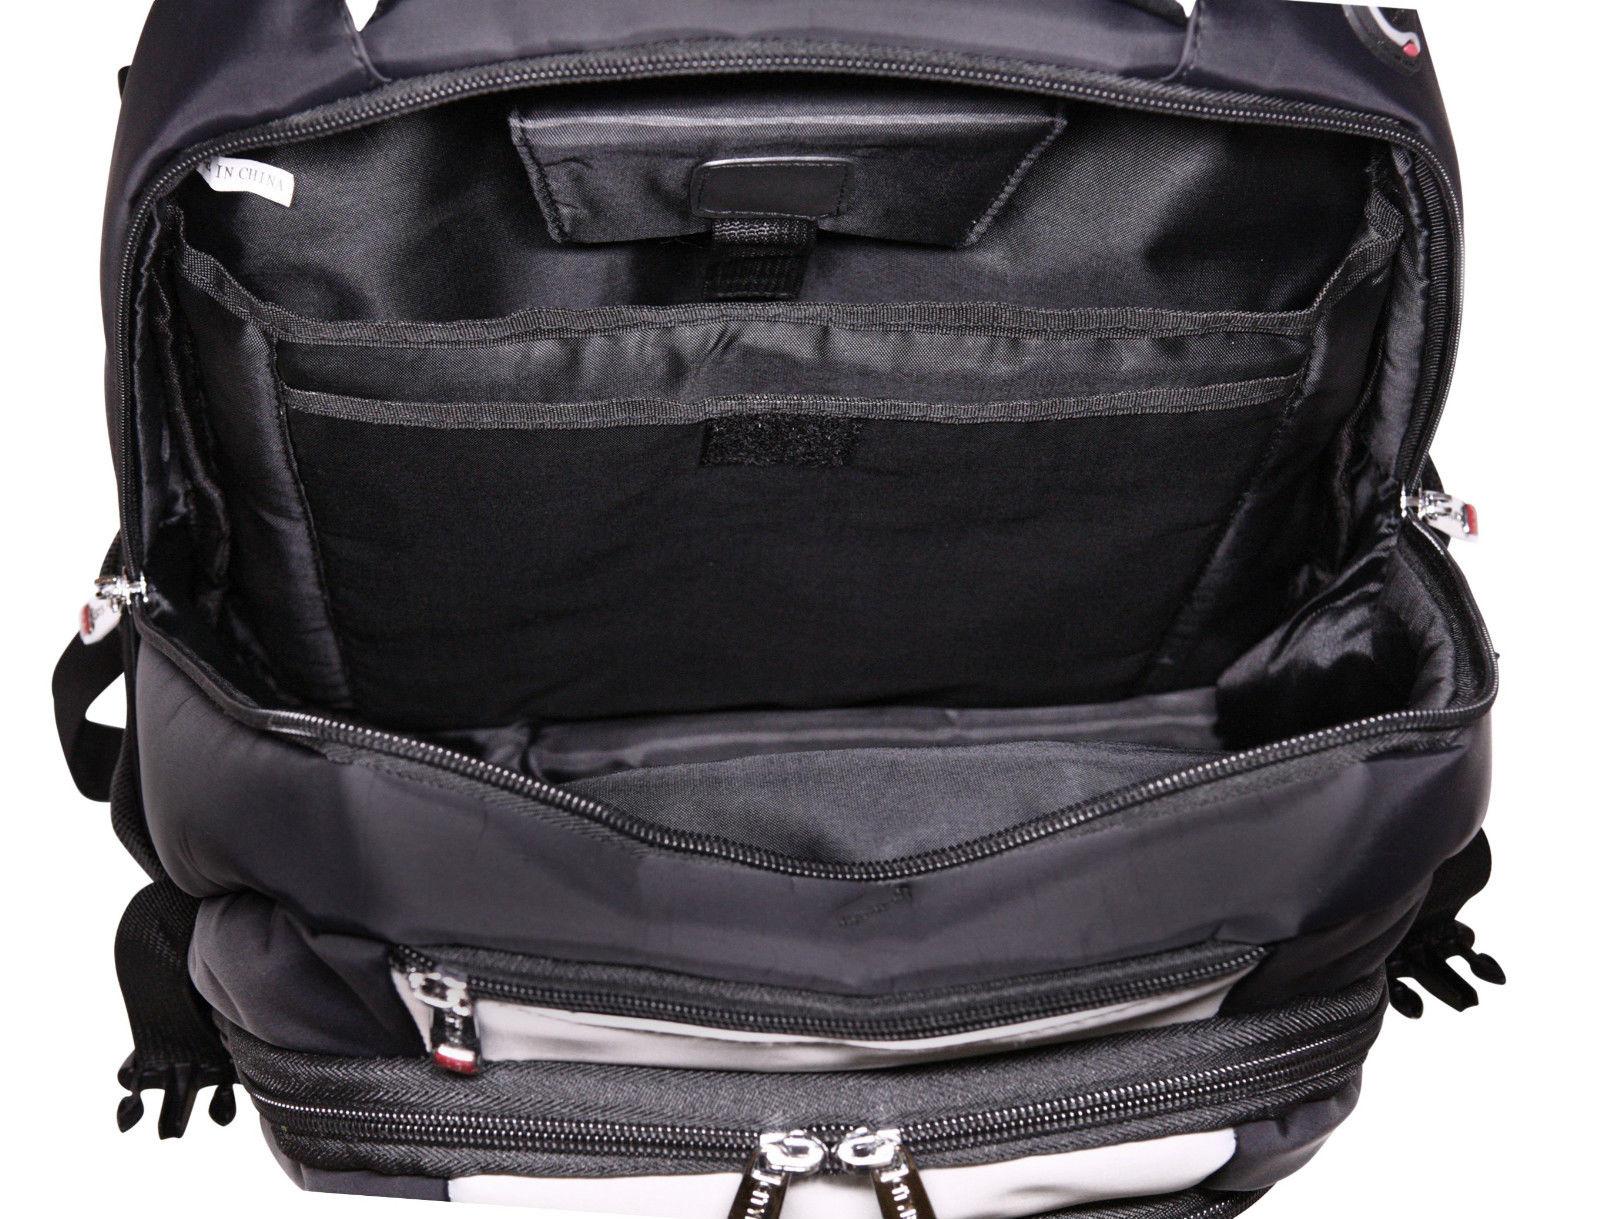 City-Bag-Laptop-Backpack-Mens-15-6-Inch-Business-Bag-Commuter-Water-Resistant-Ca